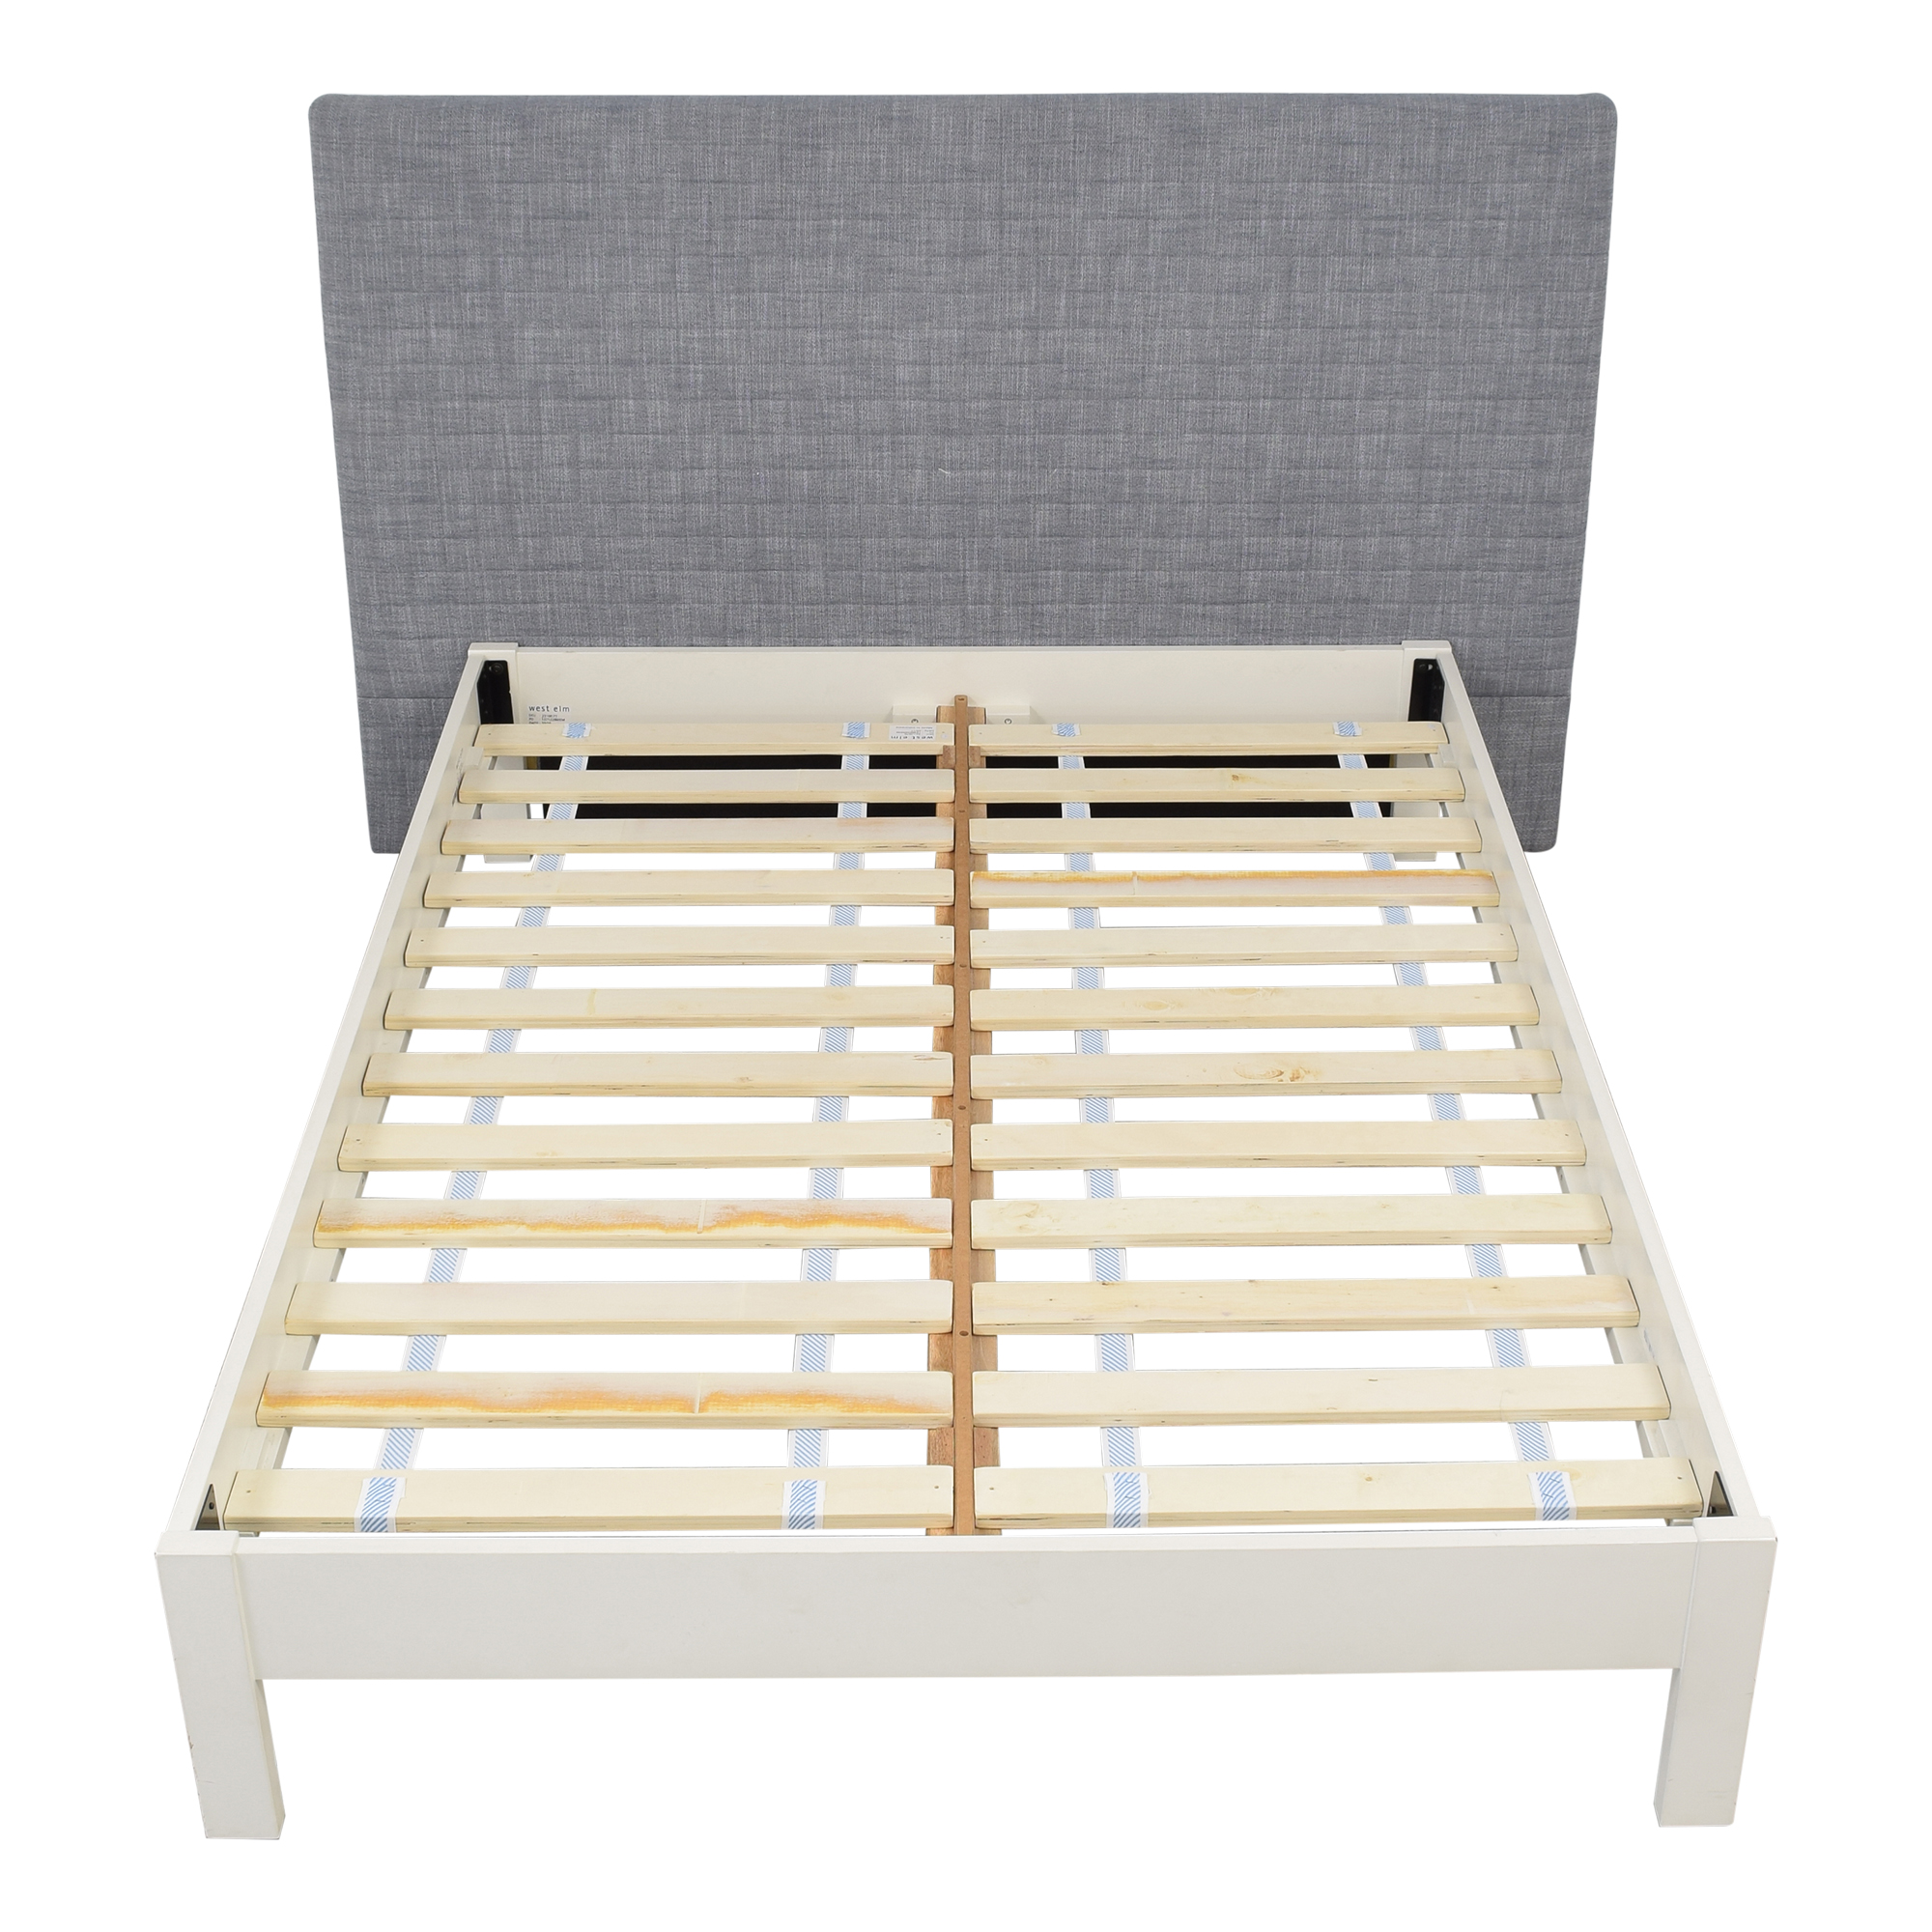 West Elm West Elm Full Size Simple Bed Frame with Upholstered Headboard light blue & white